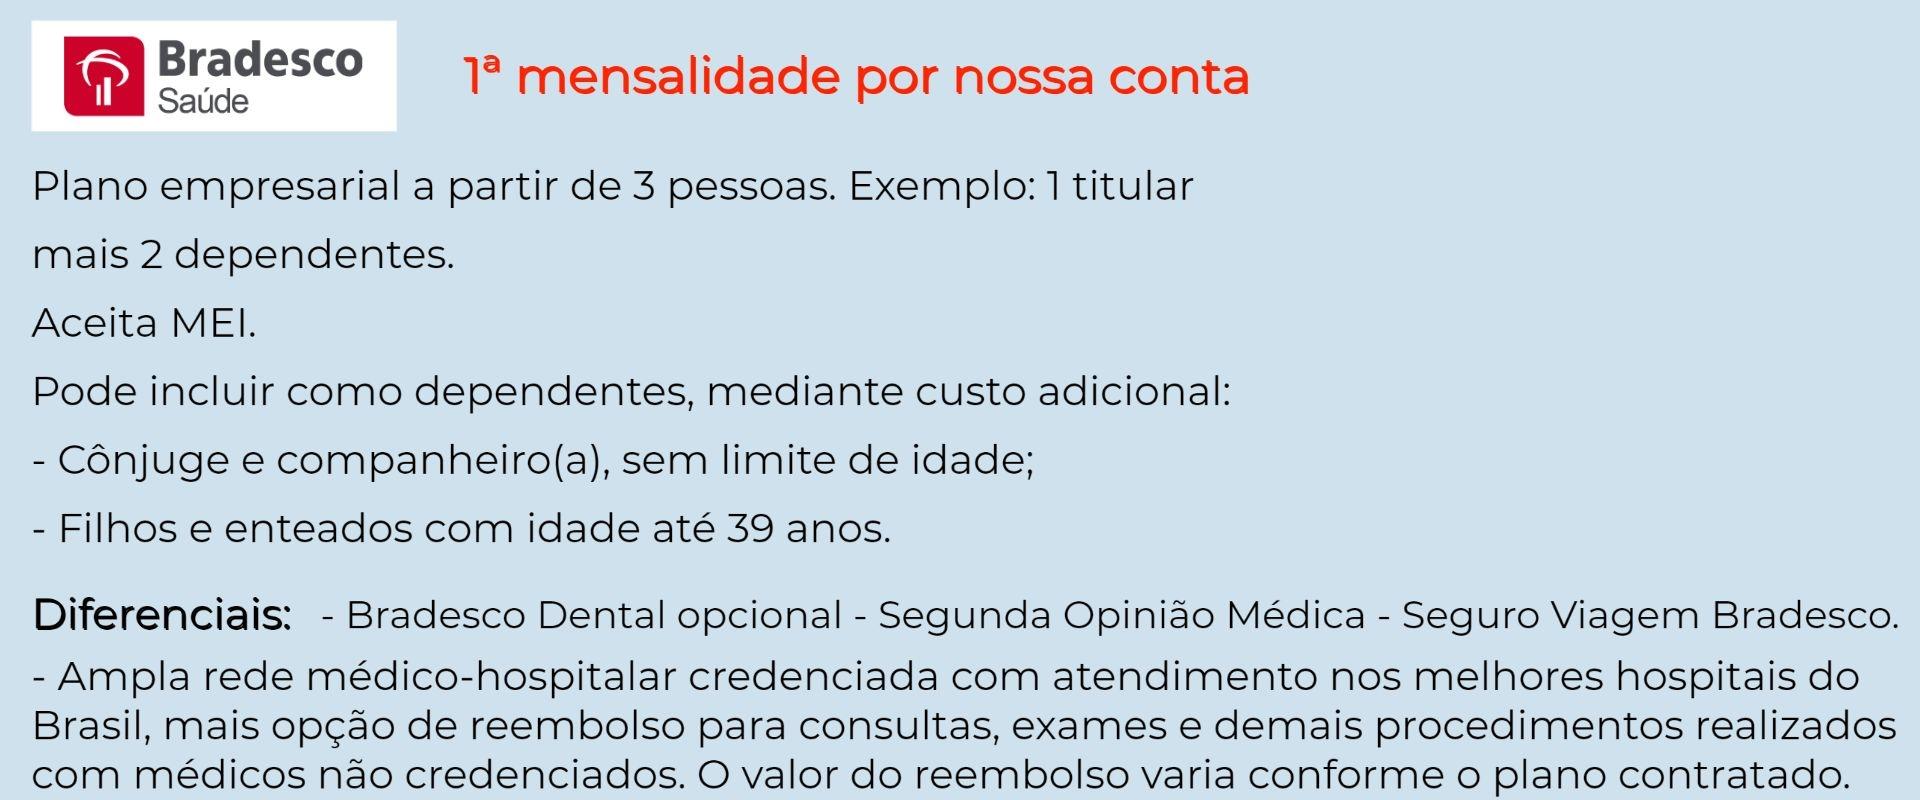 Bradesco Saúde Empresarial - Araraquara